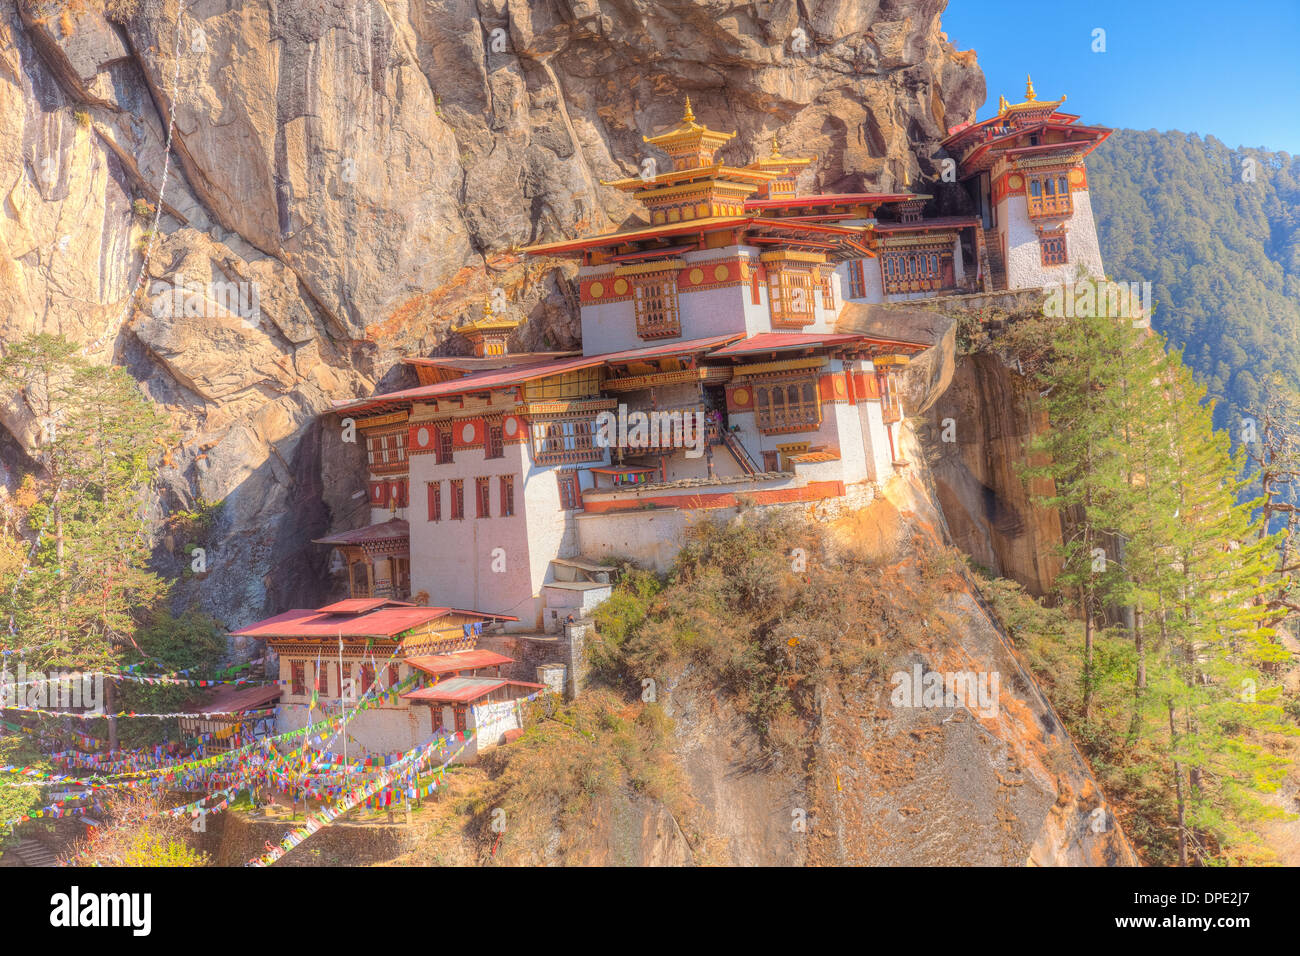 Die Tigers Nest Kloster. Bhutan, Himalaya-Gebirge, Paro-Tal. Taktshang Goemba. Thront 3.000 Fuß über dem Tal Stockfoto